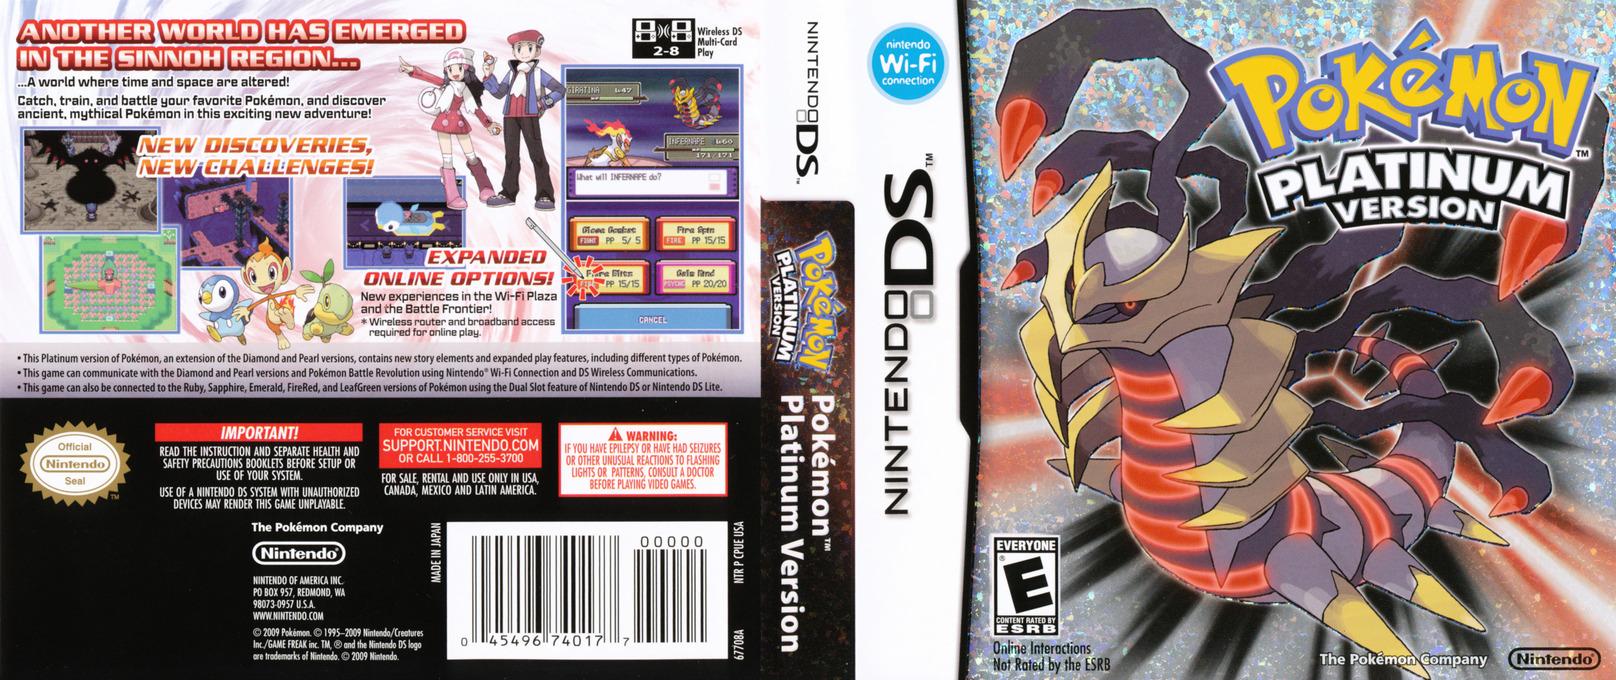 Pokémon - Platinum Version DS coverfullHQ (CPUE)